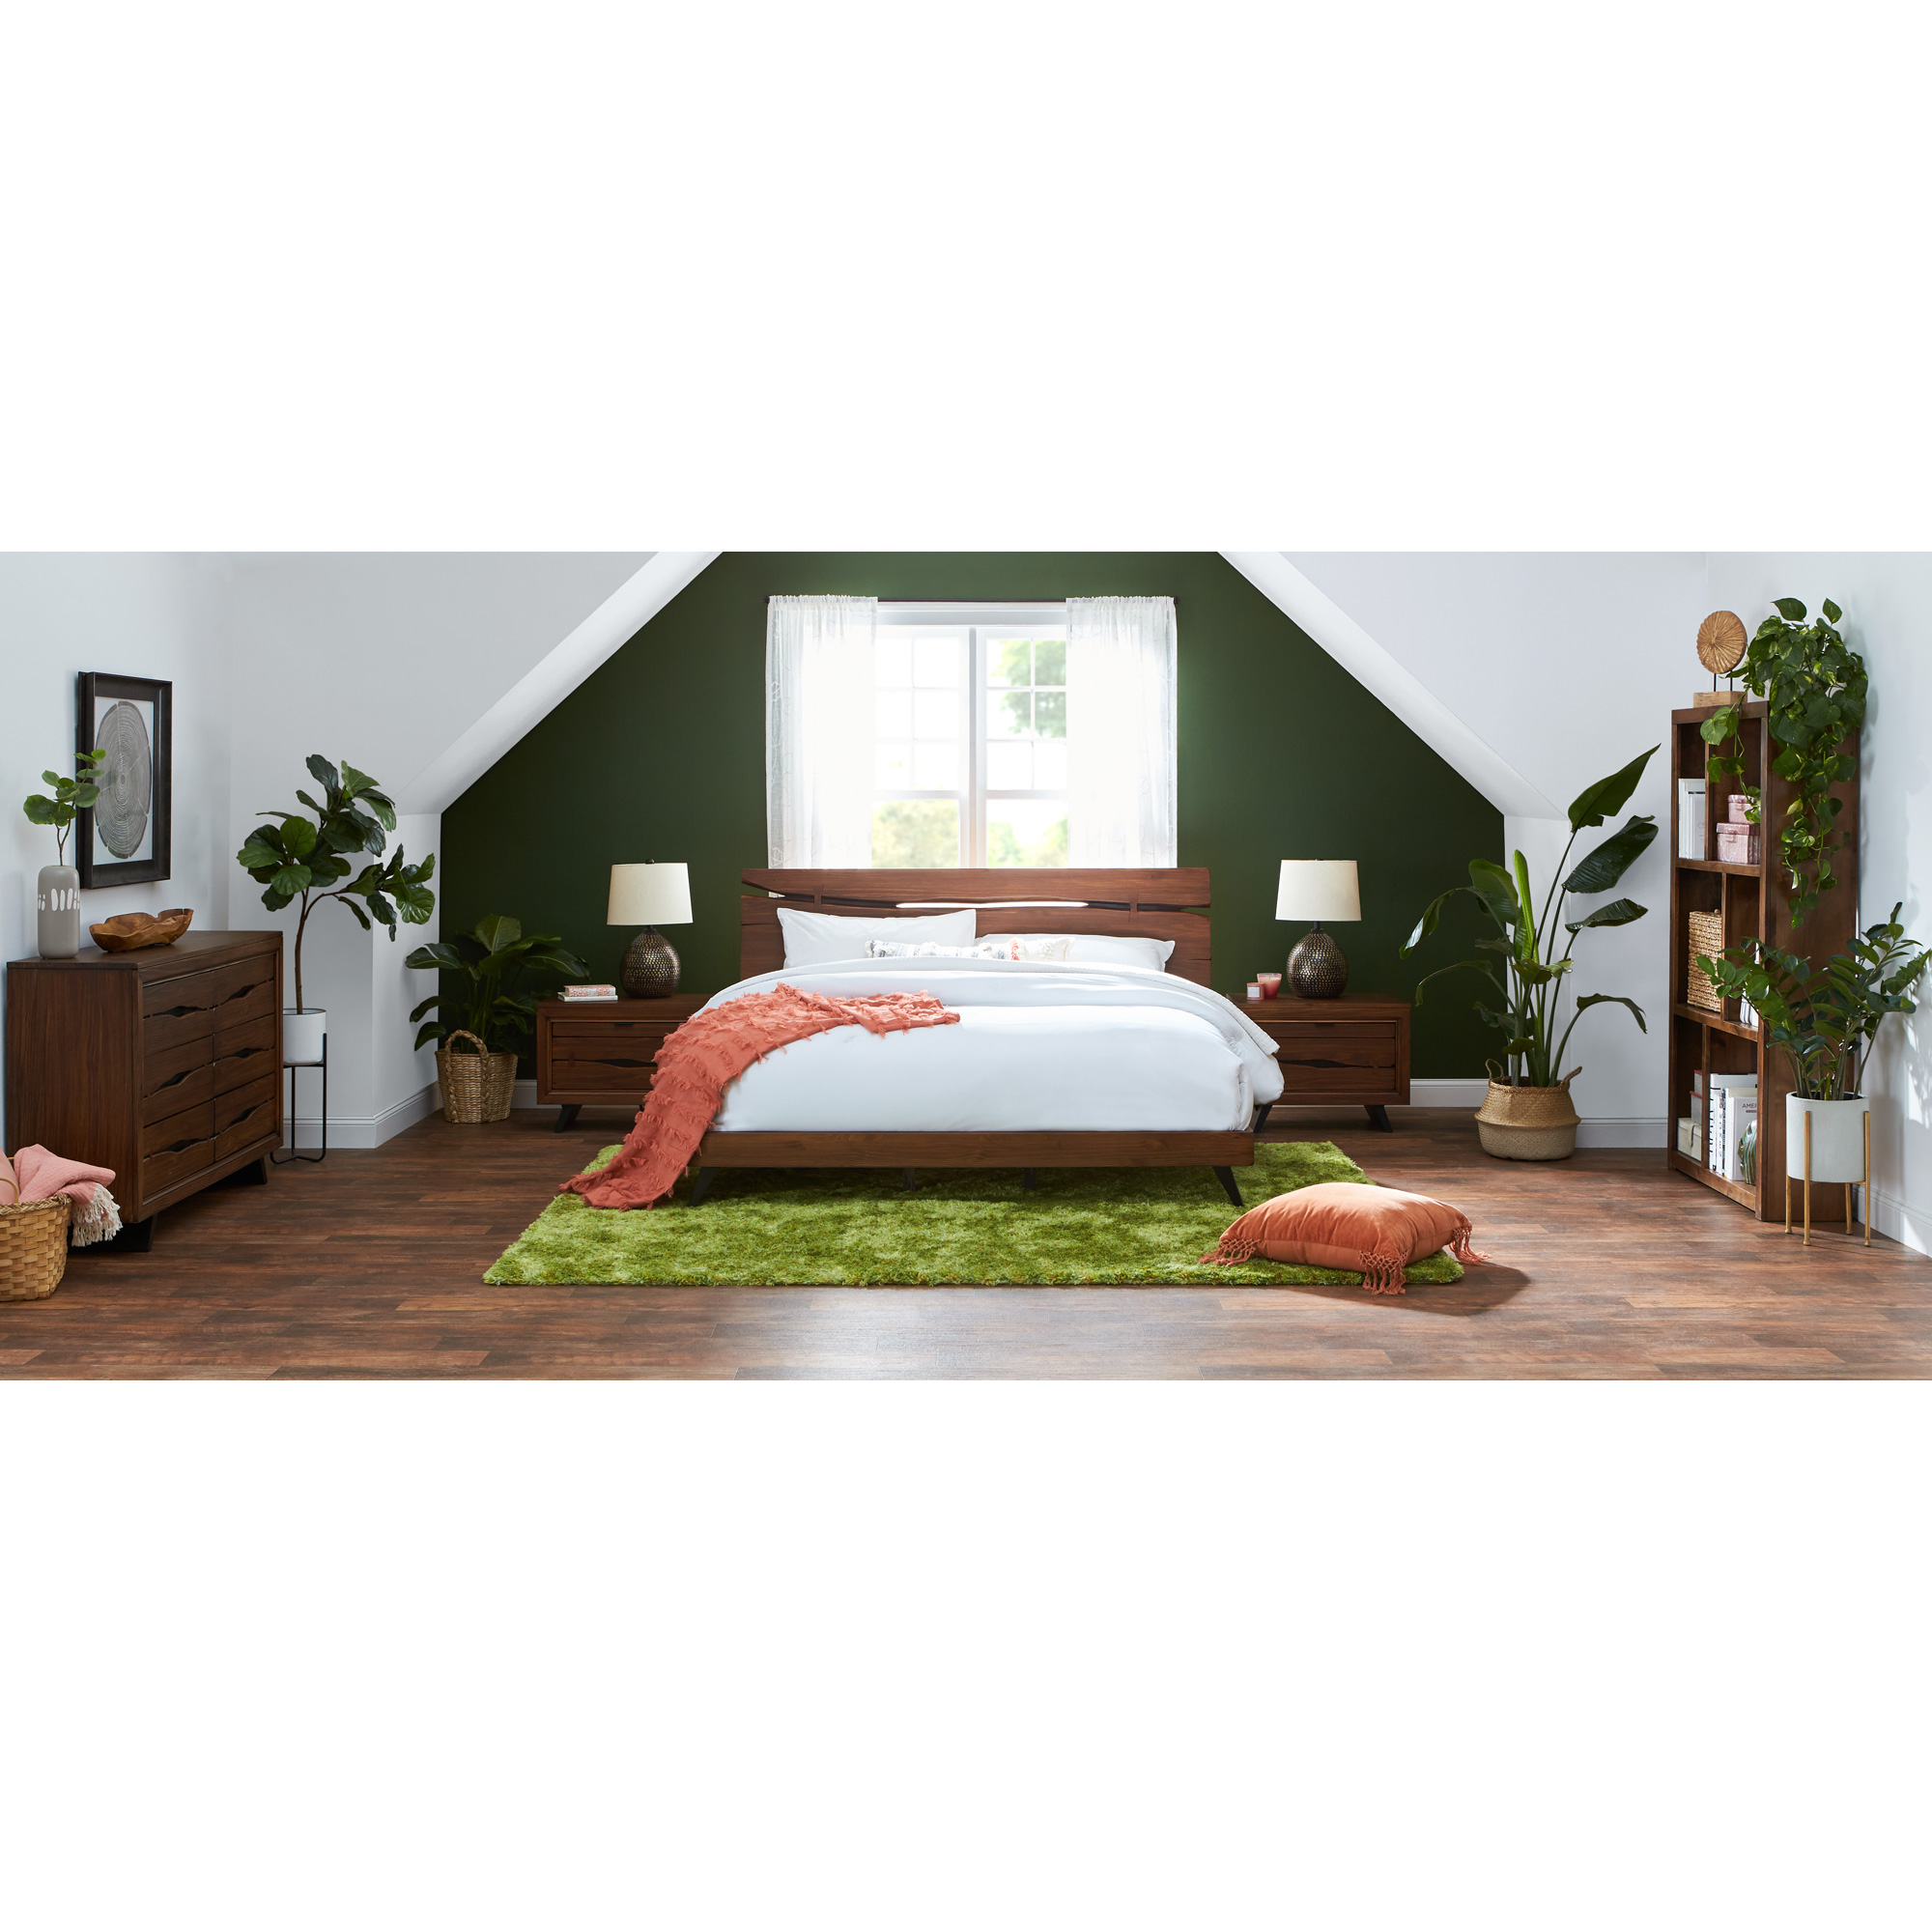 Rotta | Dana Point Rustic Brown Full 4 Piece Room Group Bedroom Set